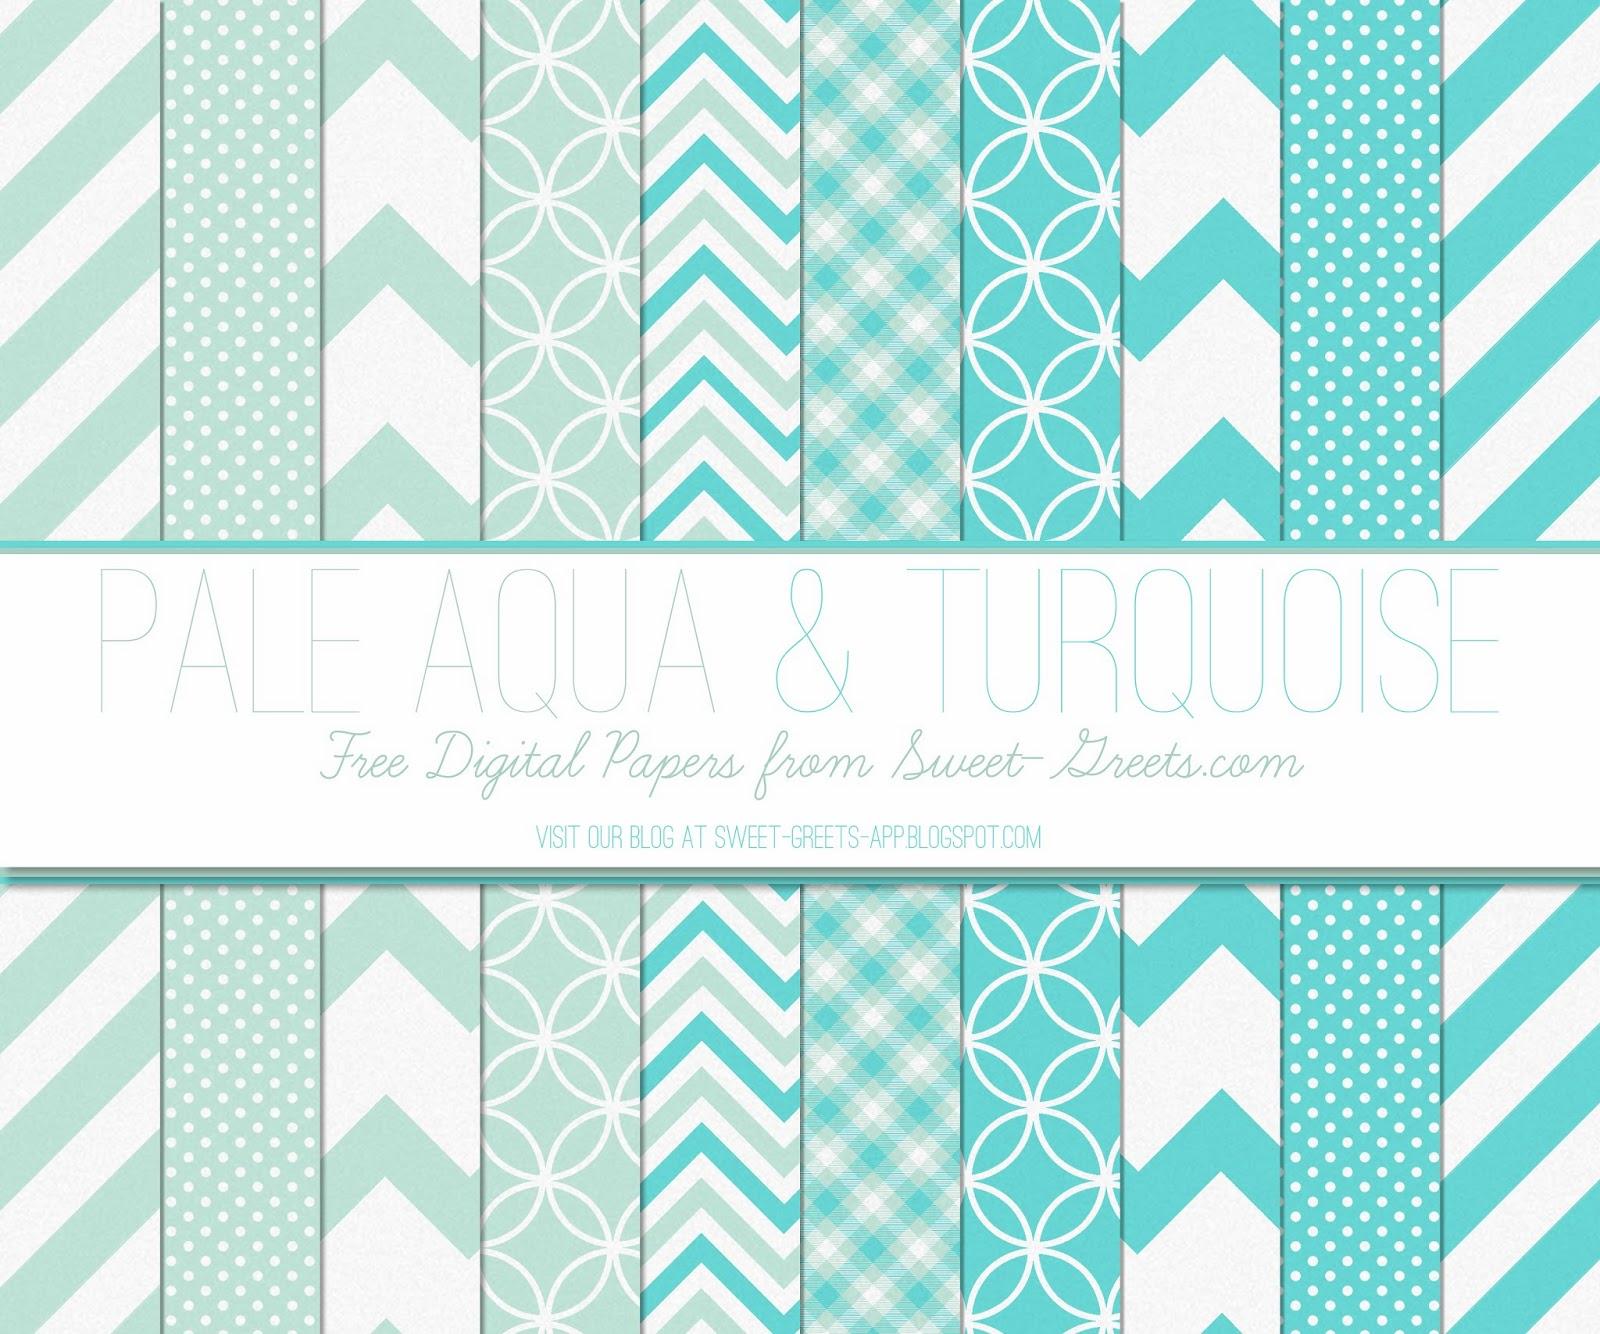 Just Peachy Designs: Free Digital Paper: Aqua and Turquoise